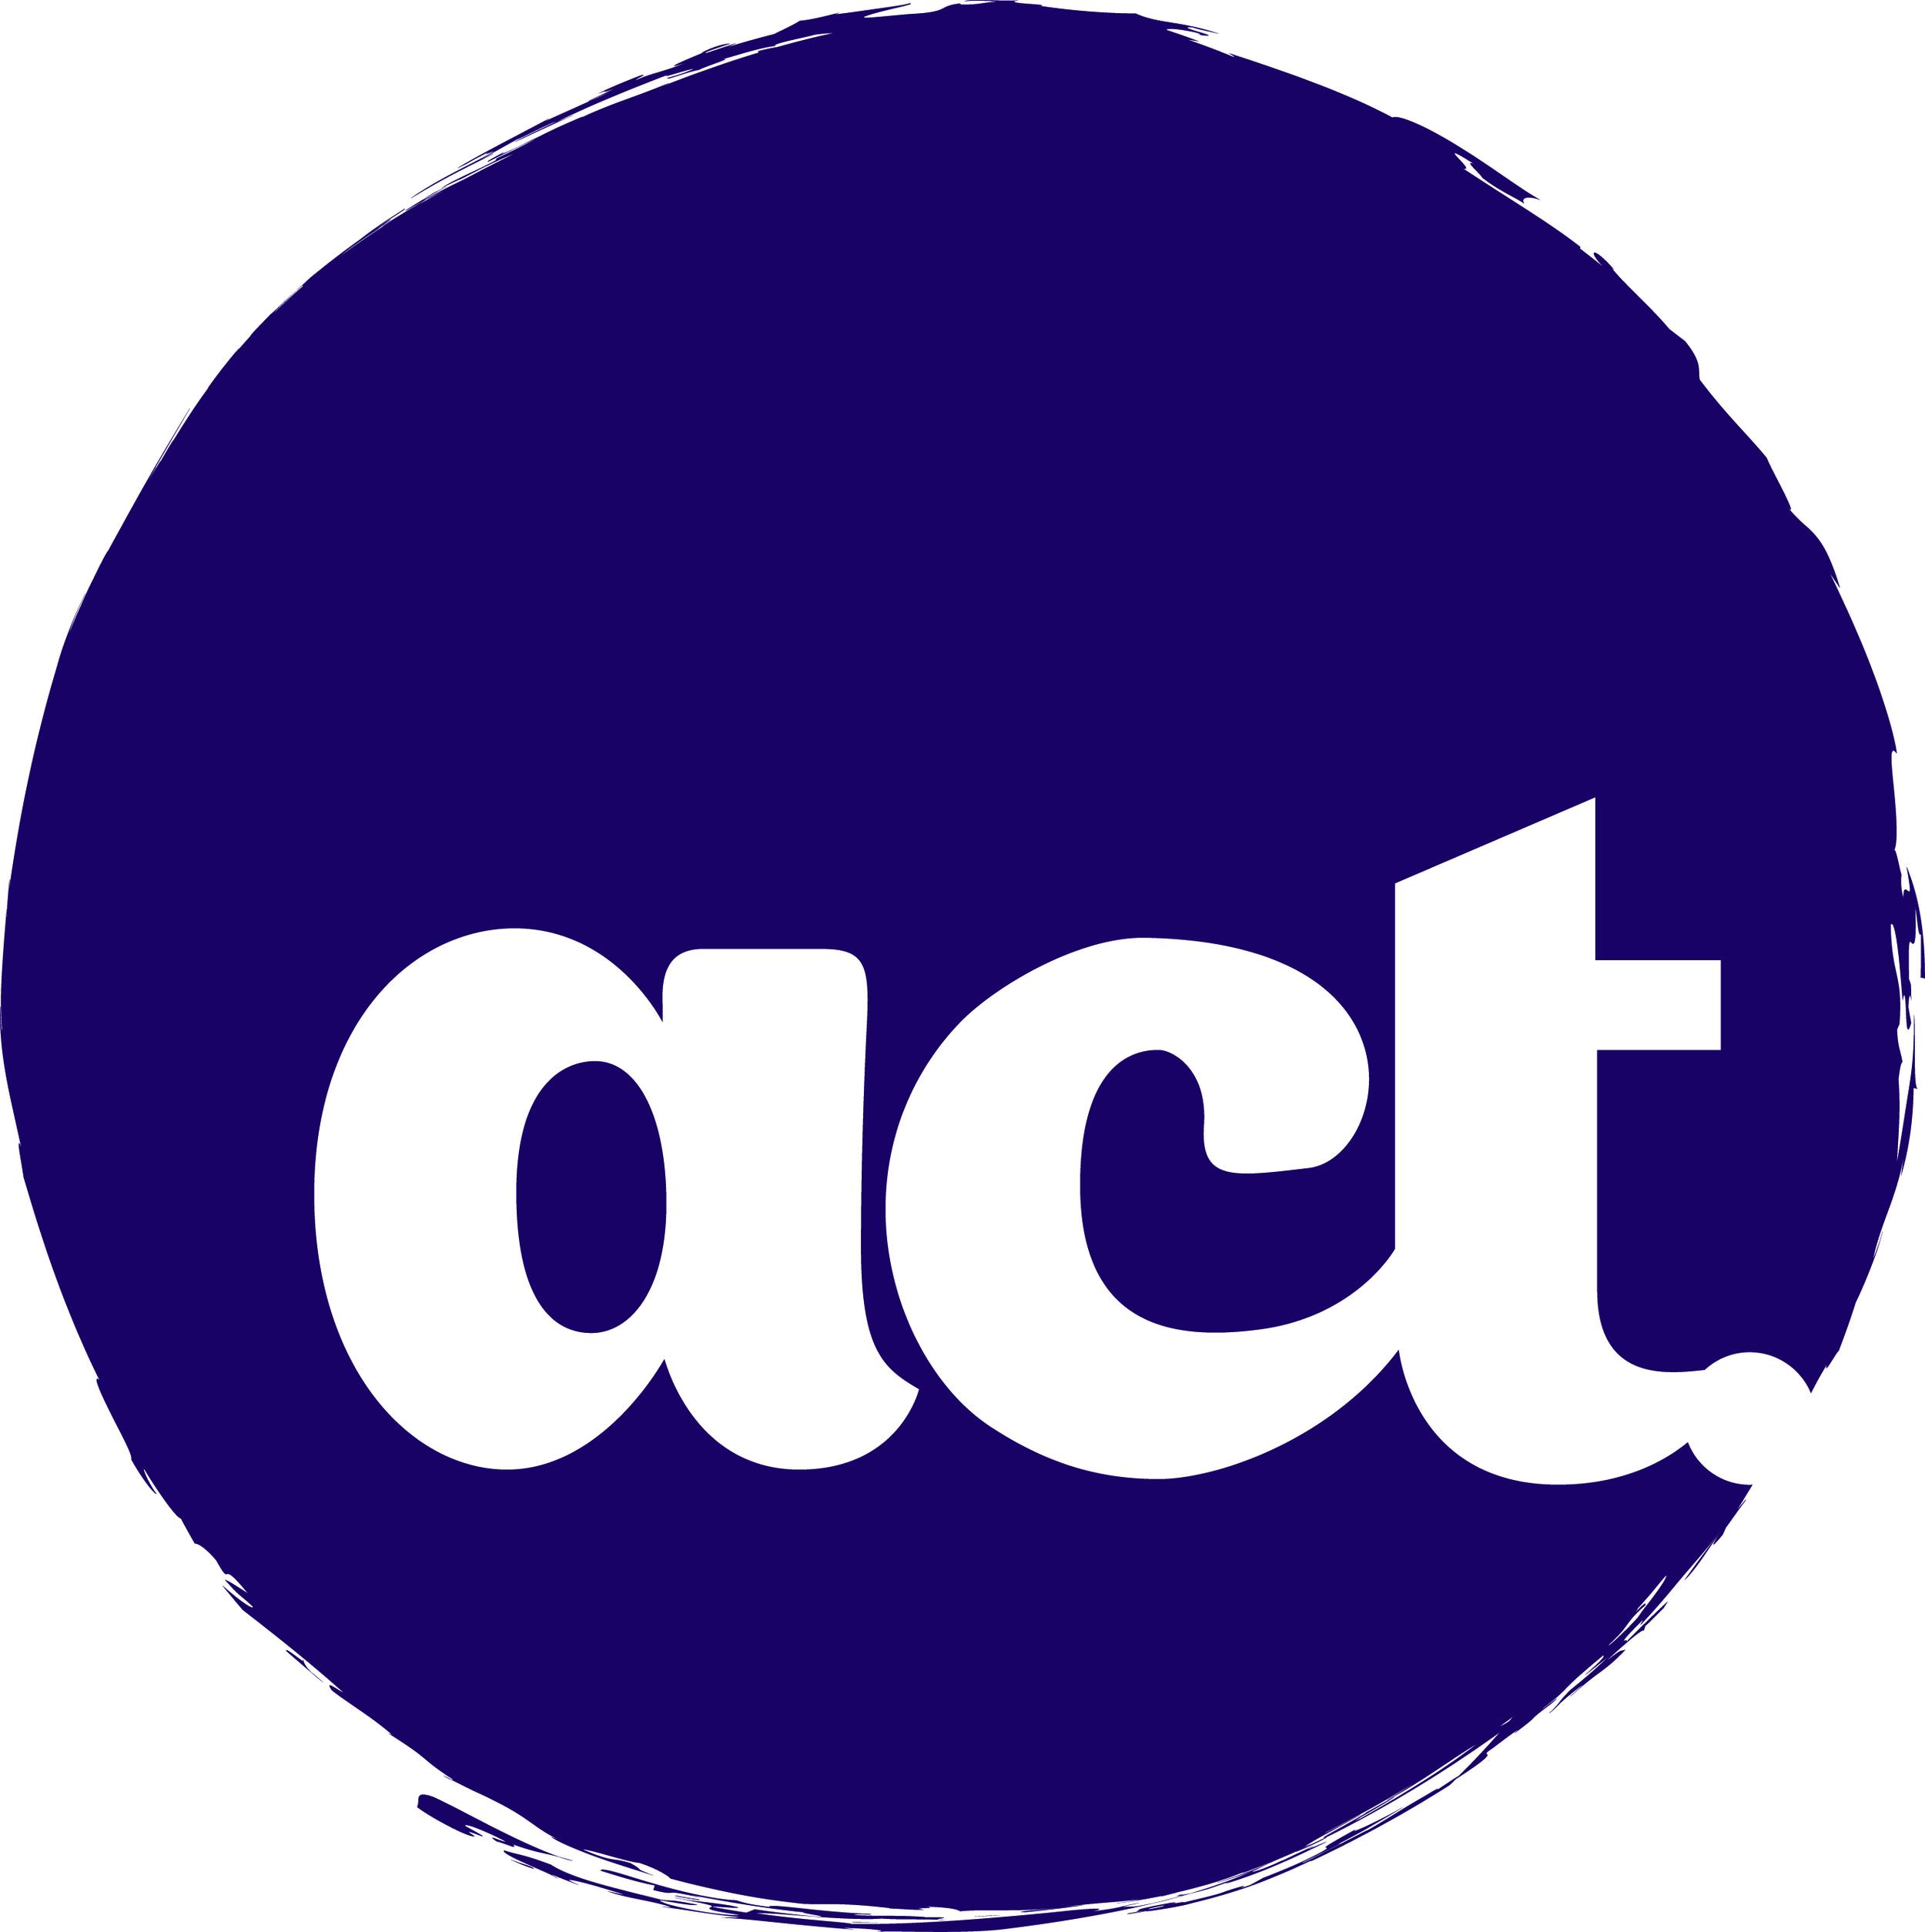 Act-logo-solid-purple.jpg